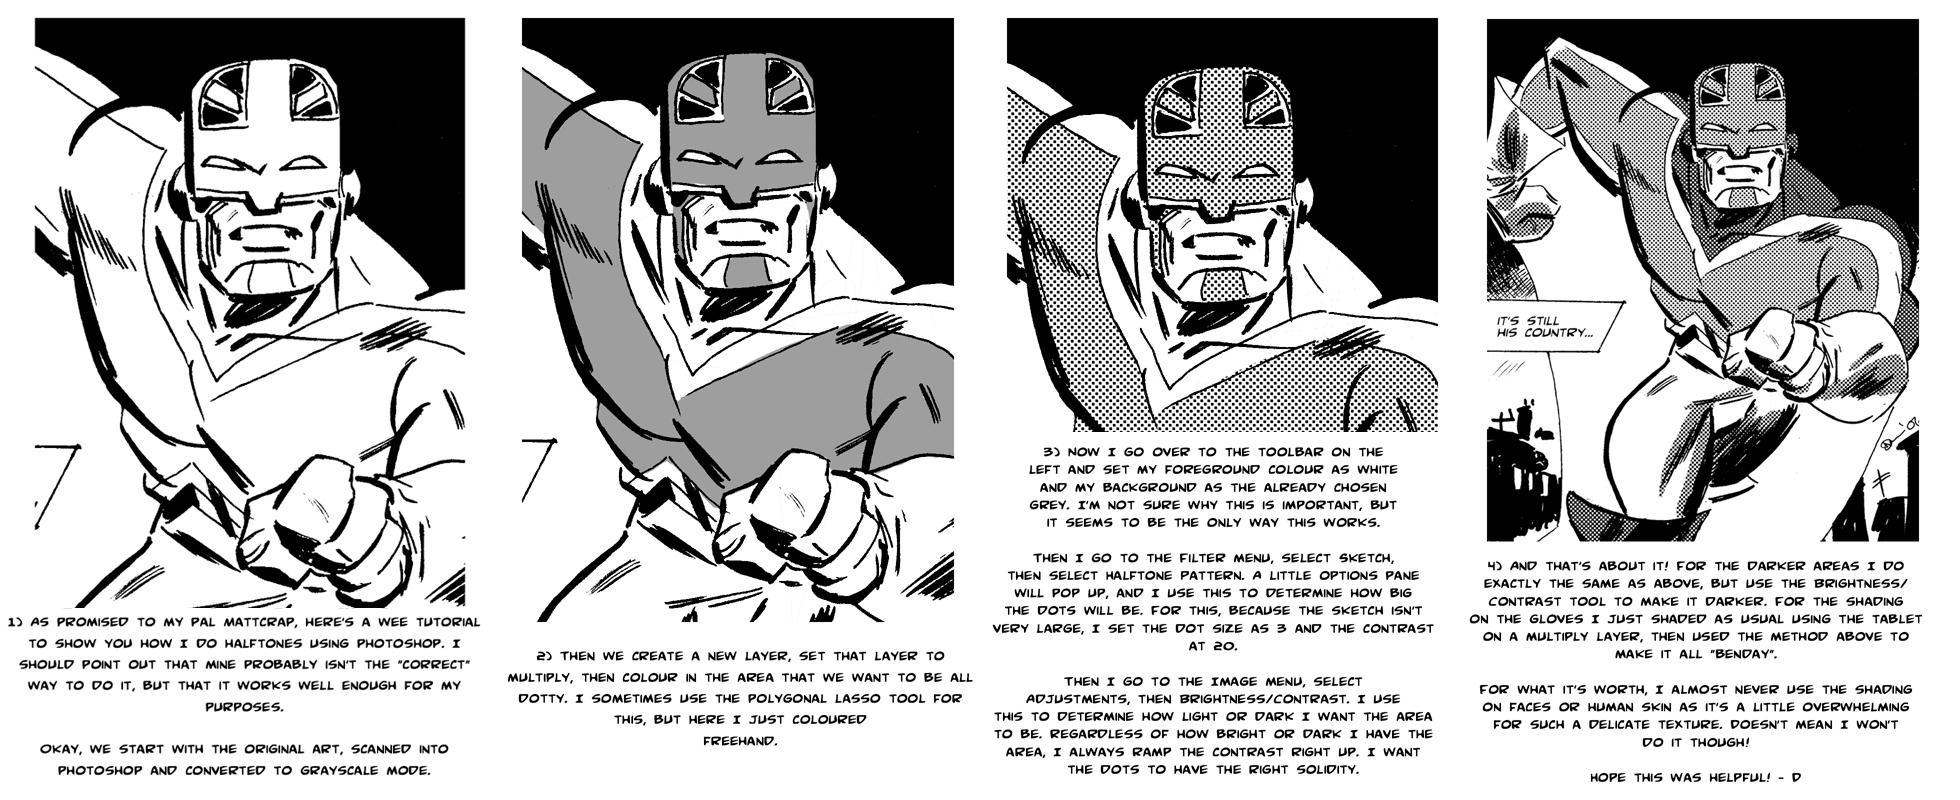 Halftone tutorial by danmcdaid on deviantart halftone tutorial by danmcdaid halftone tutorial by danmcdaid baditri Gallery